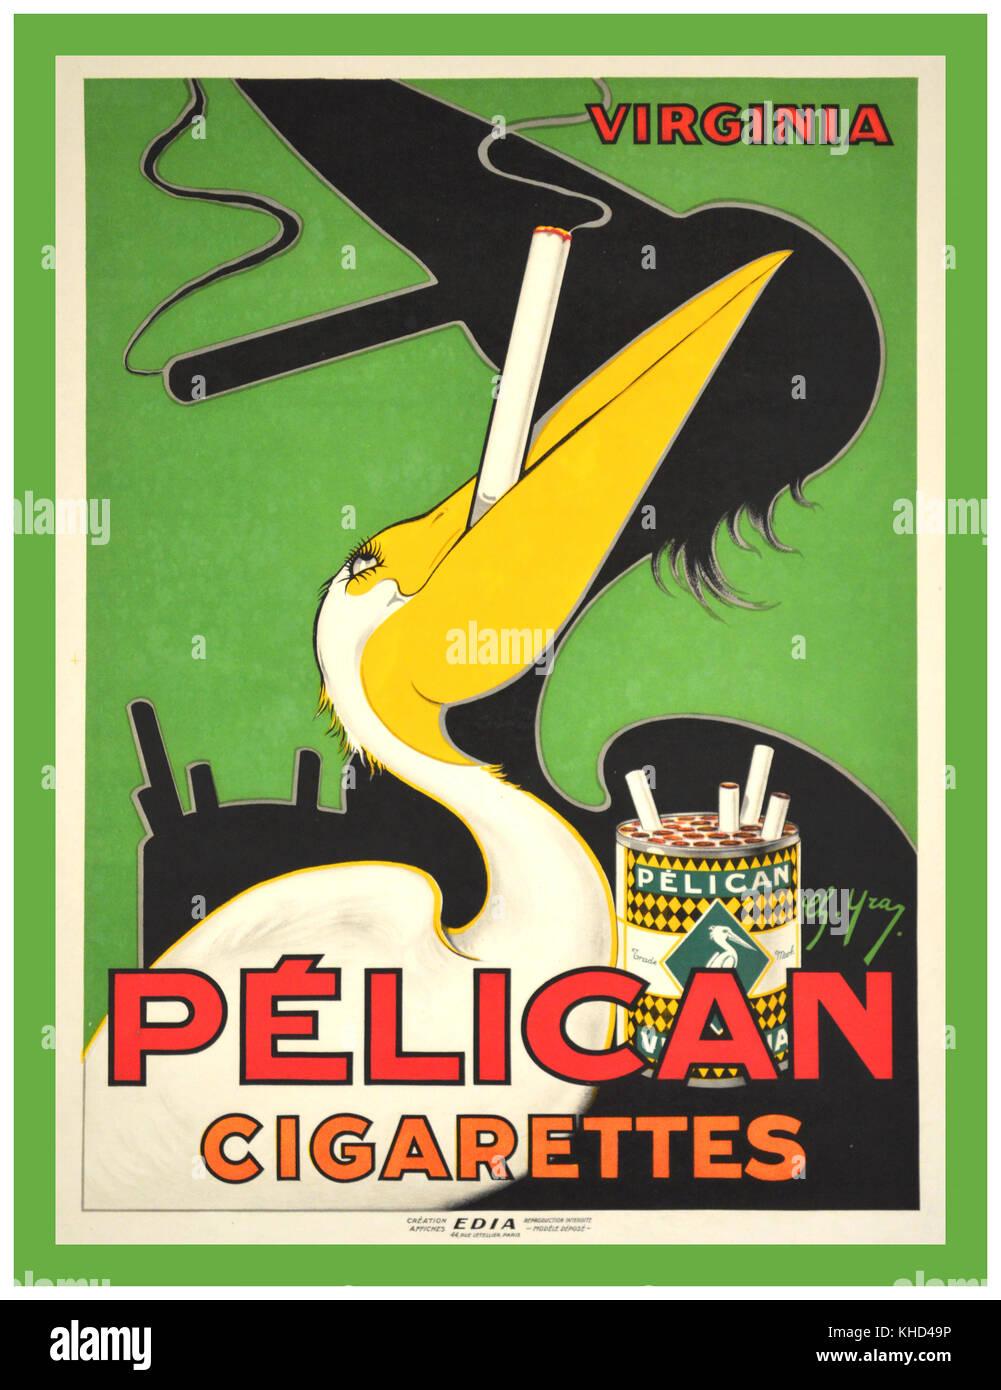 ART SMOKING 1920's Vintage Art Deco French Poster 1920s Virginia Pelican Cigarettes Smoking - Stock Image